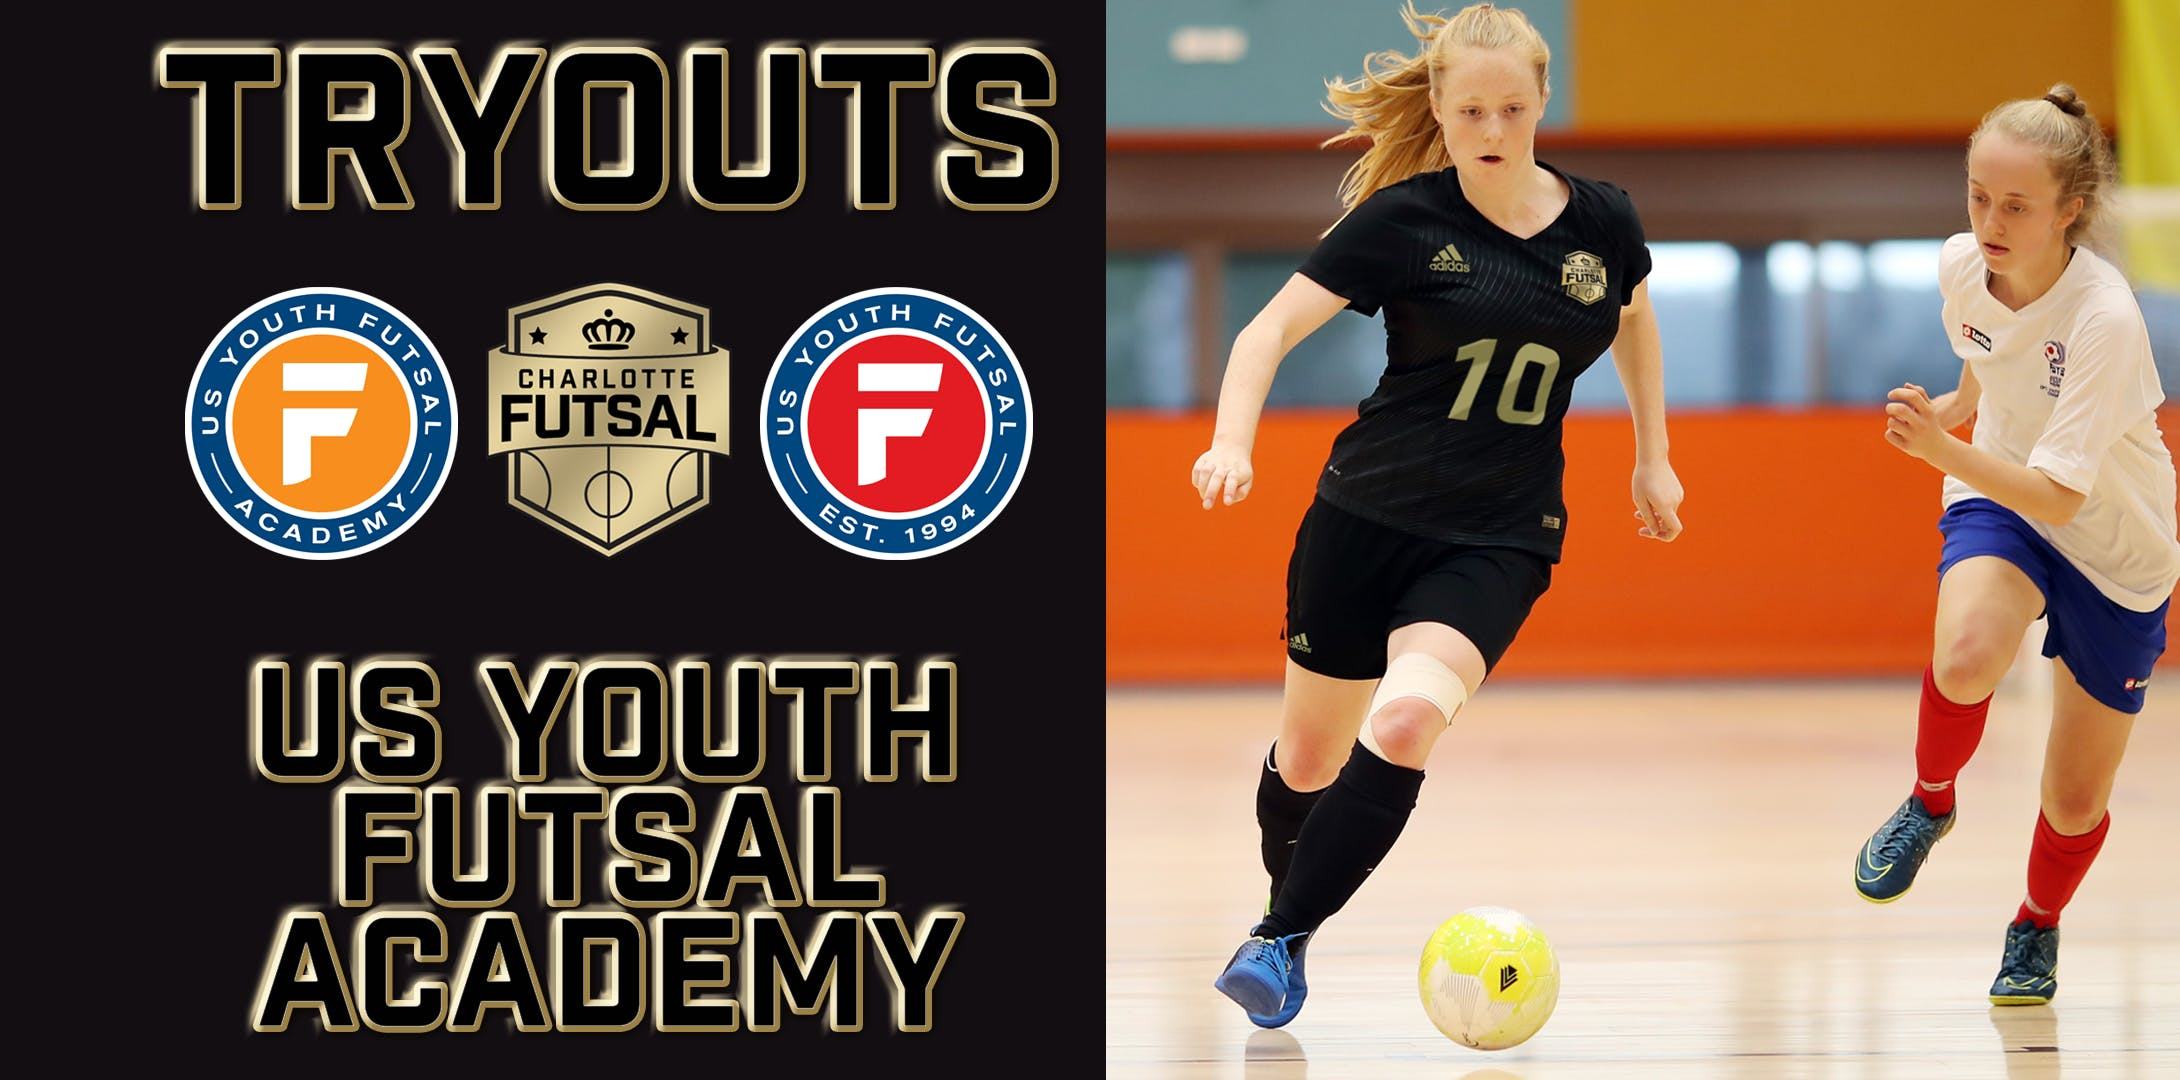 7f078fa169 2001-2006 BOYS GIRLS US YOUTH FUTSAL ACADEMY TRYOUTS - 6 JUL 2018